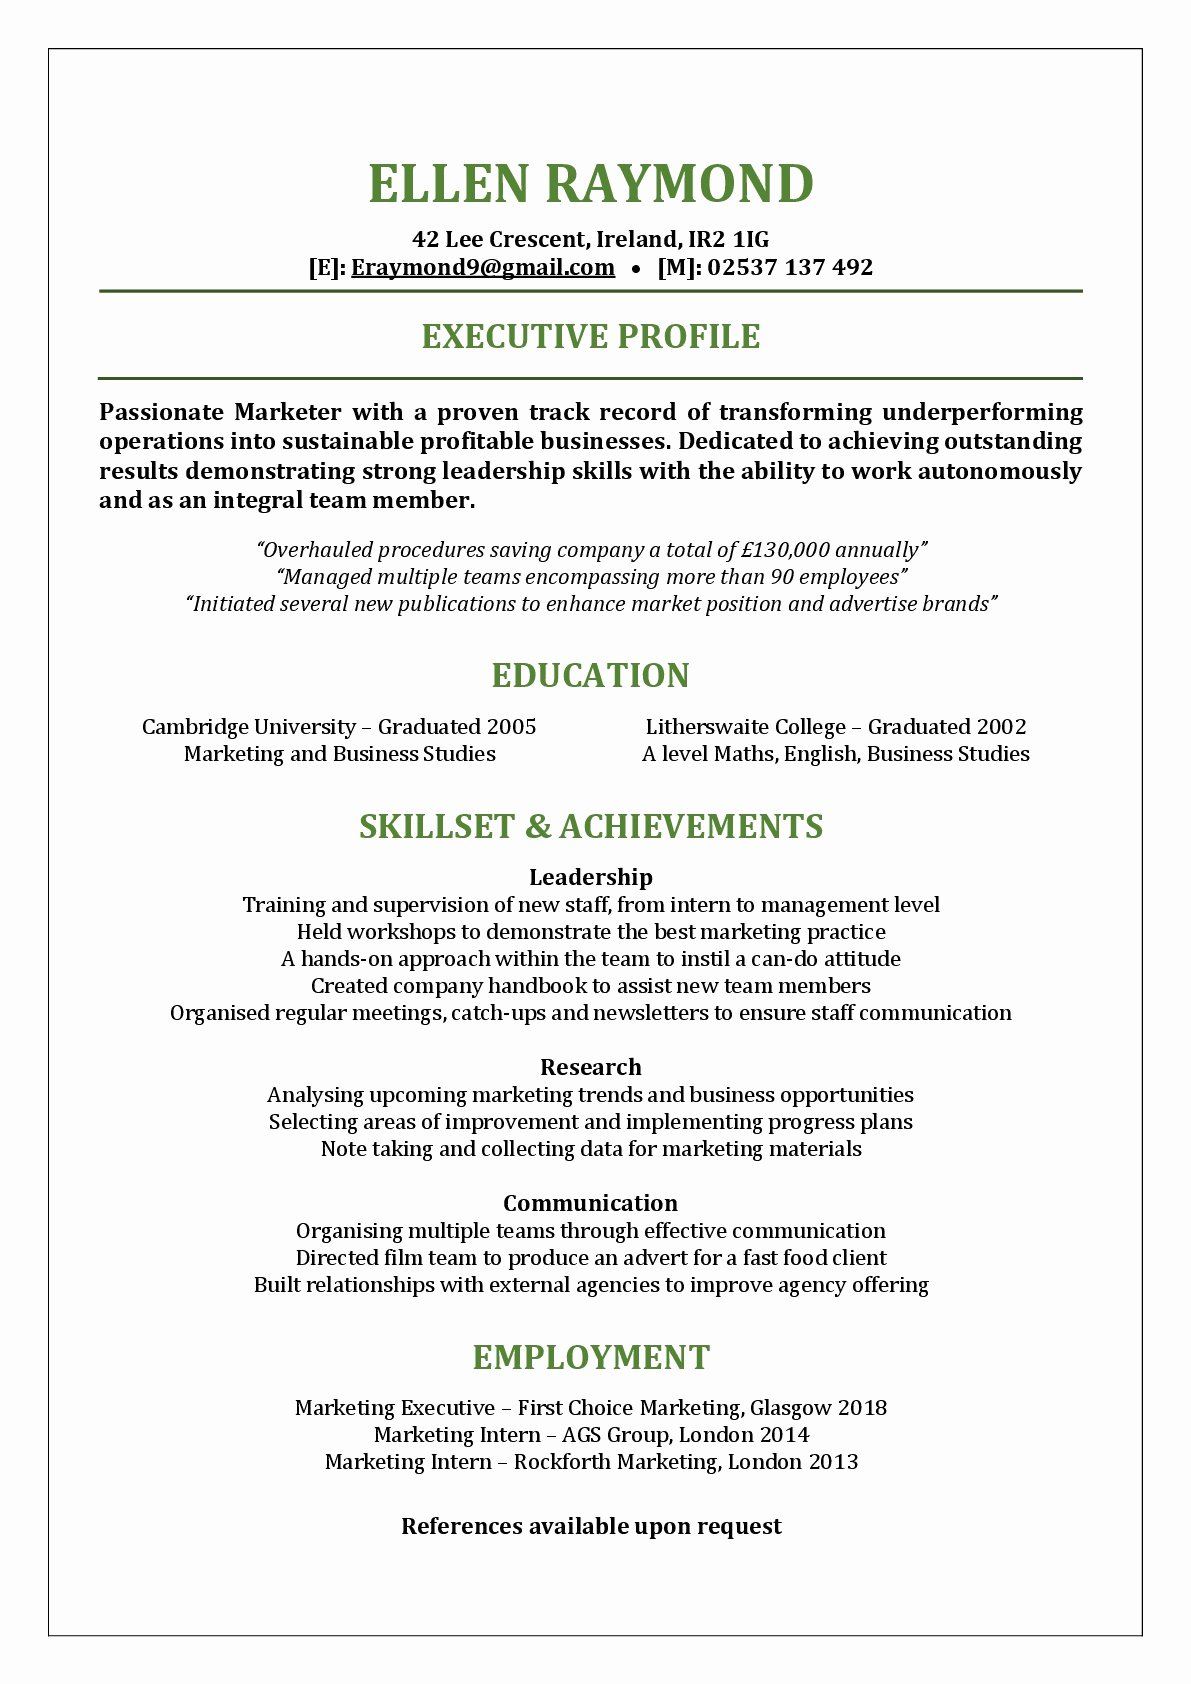 Functional Resume Template Free Beautiful Functional Resume Template – Got something to Hide